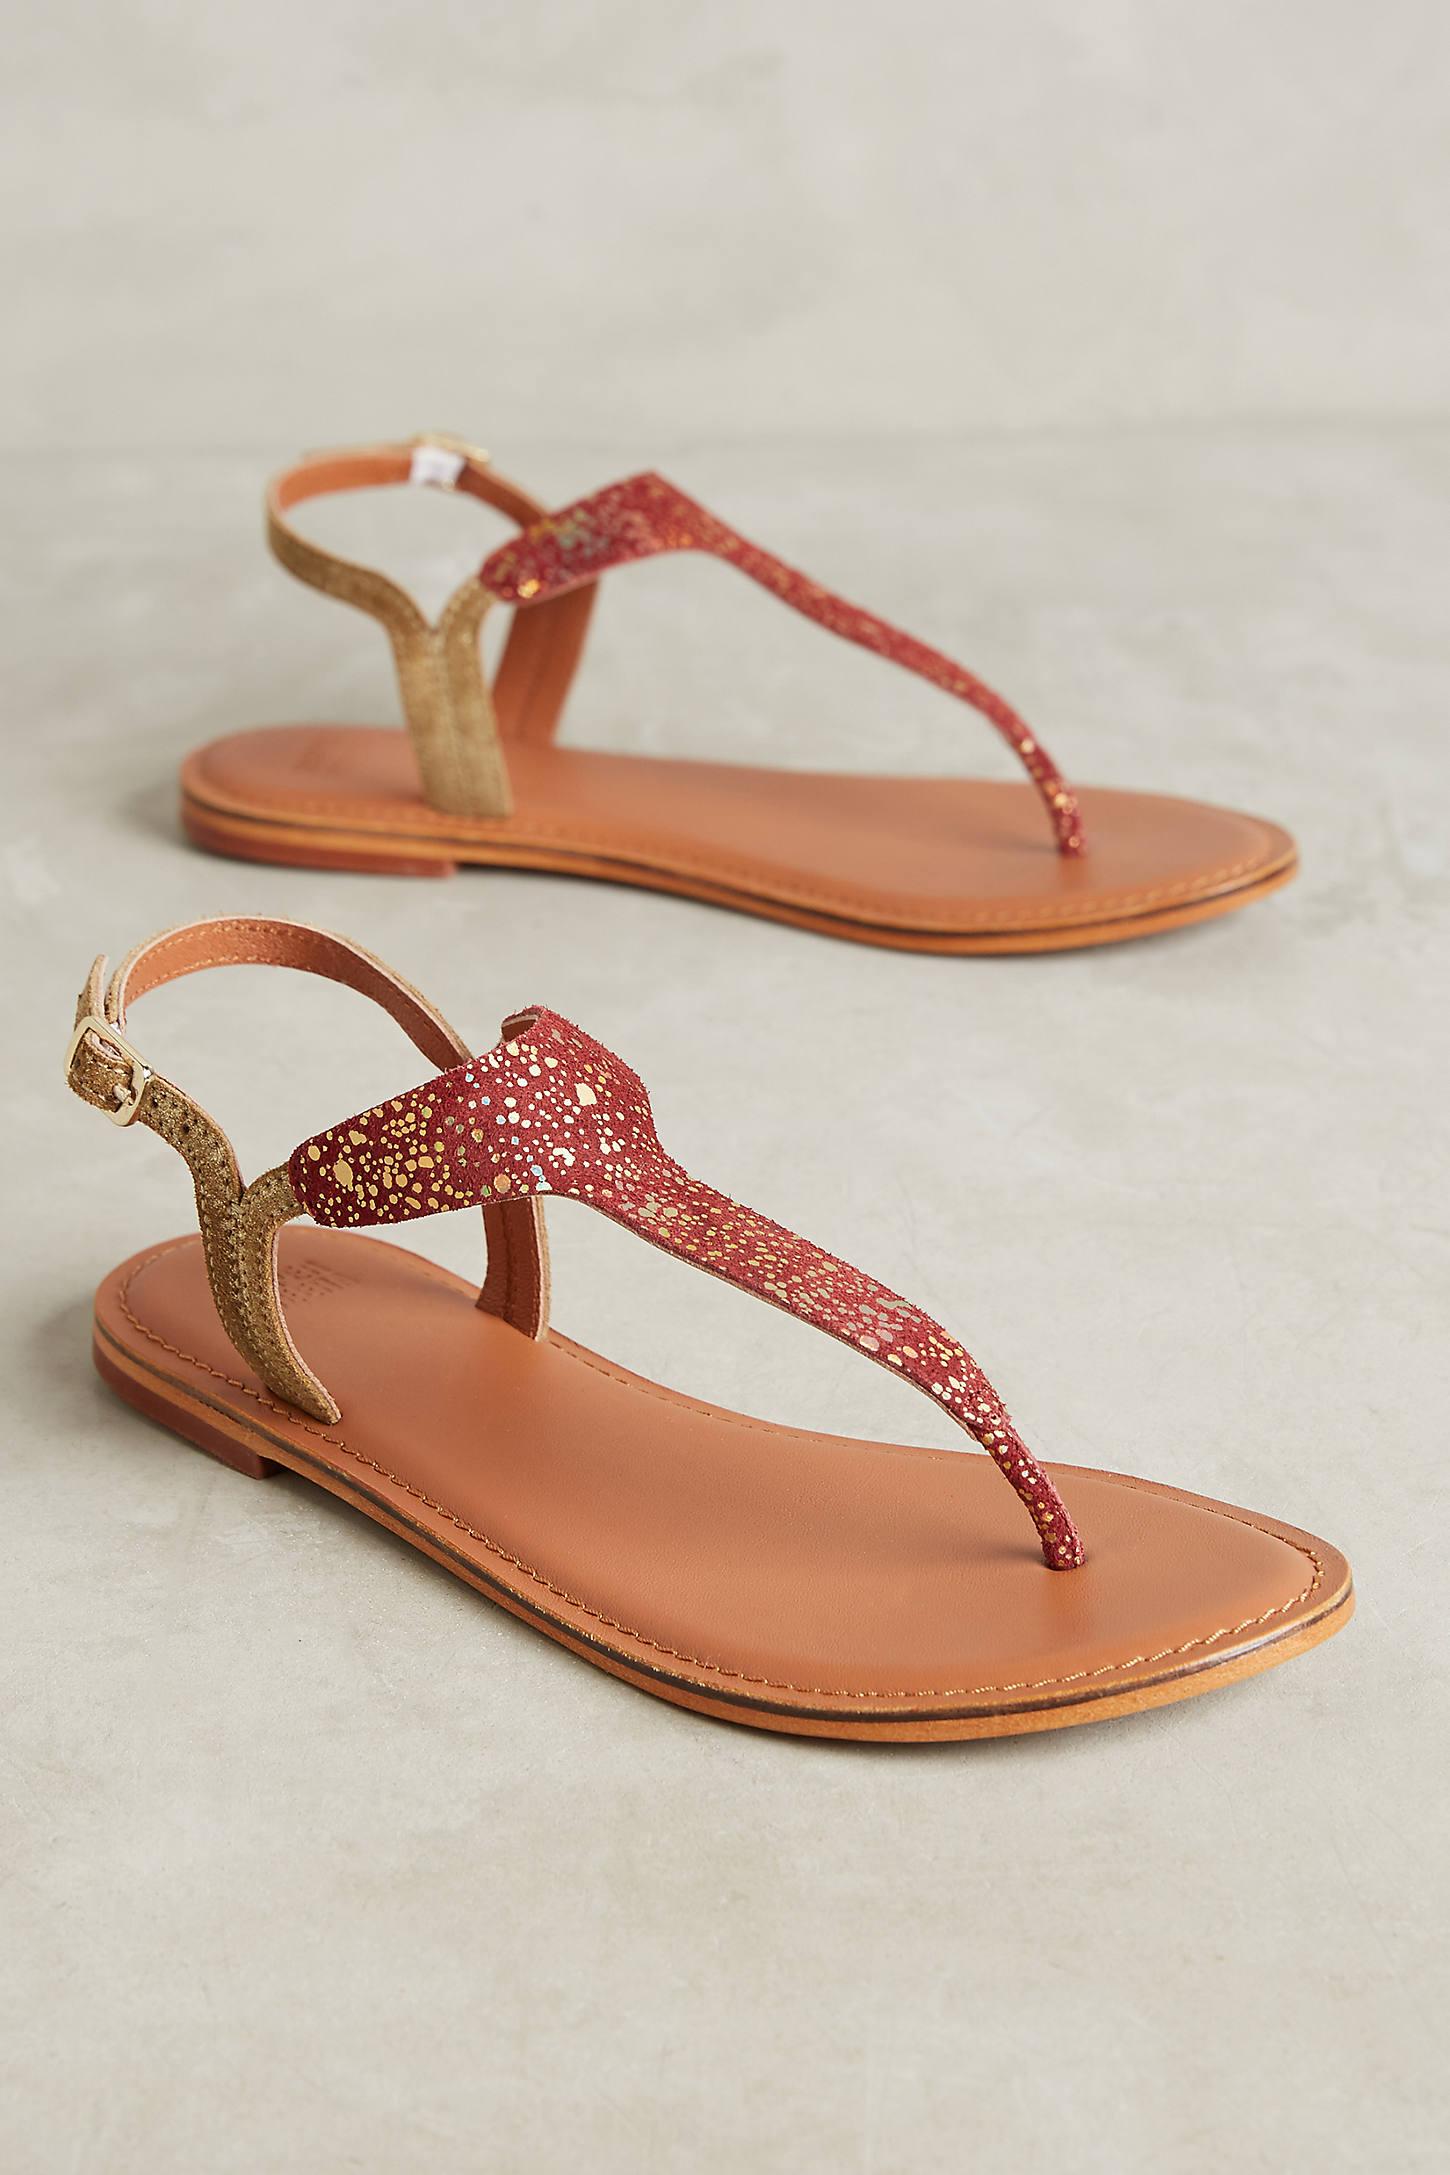 Tangerine Metallic Leather Sandals